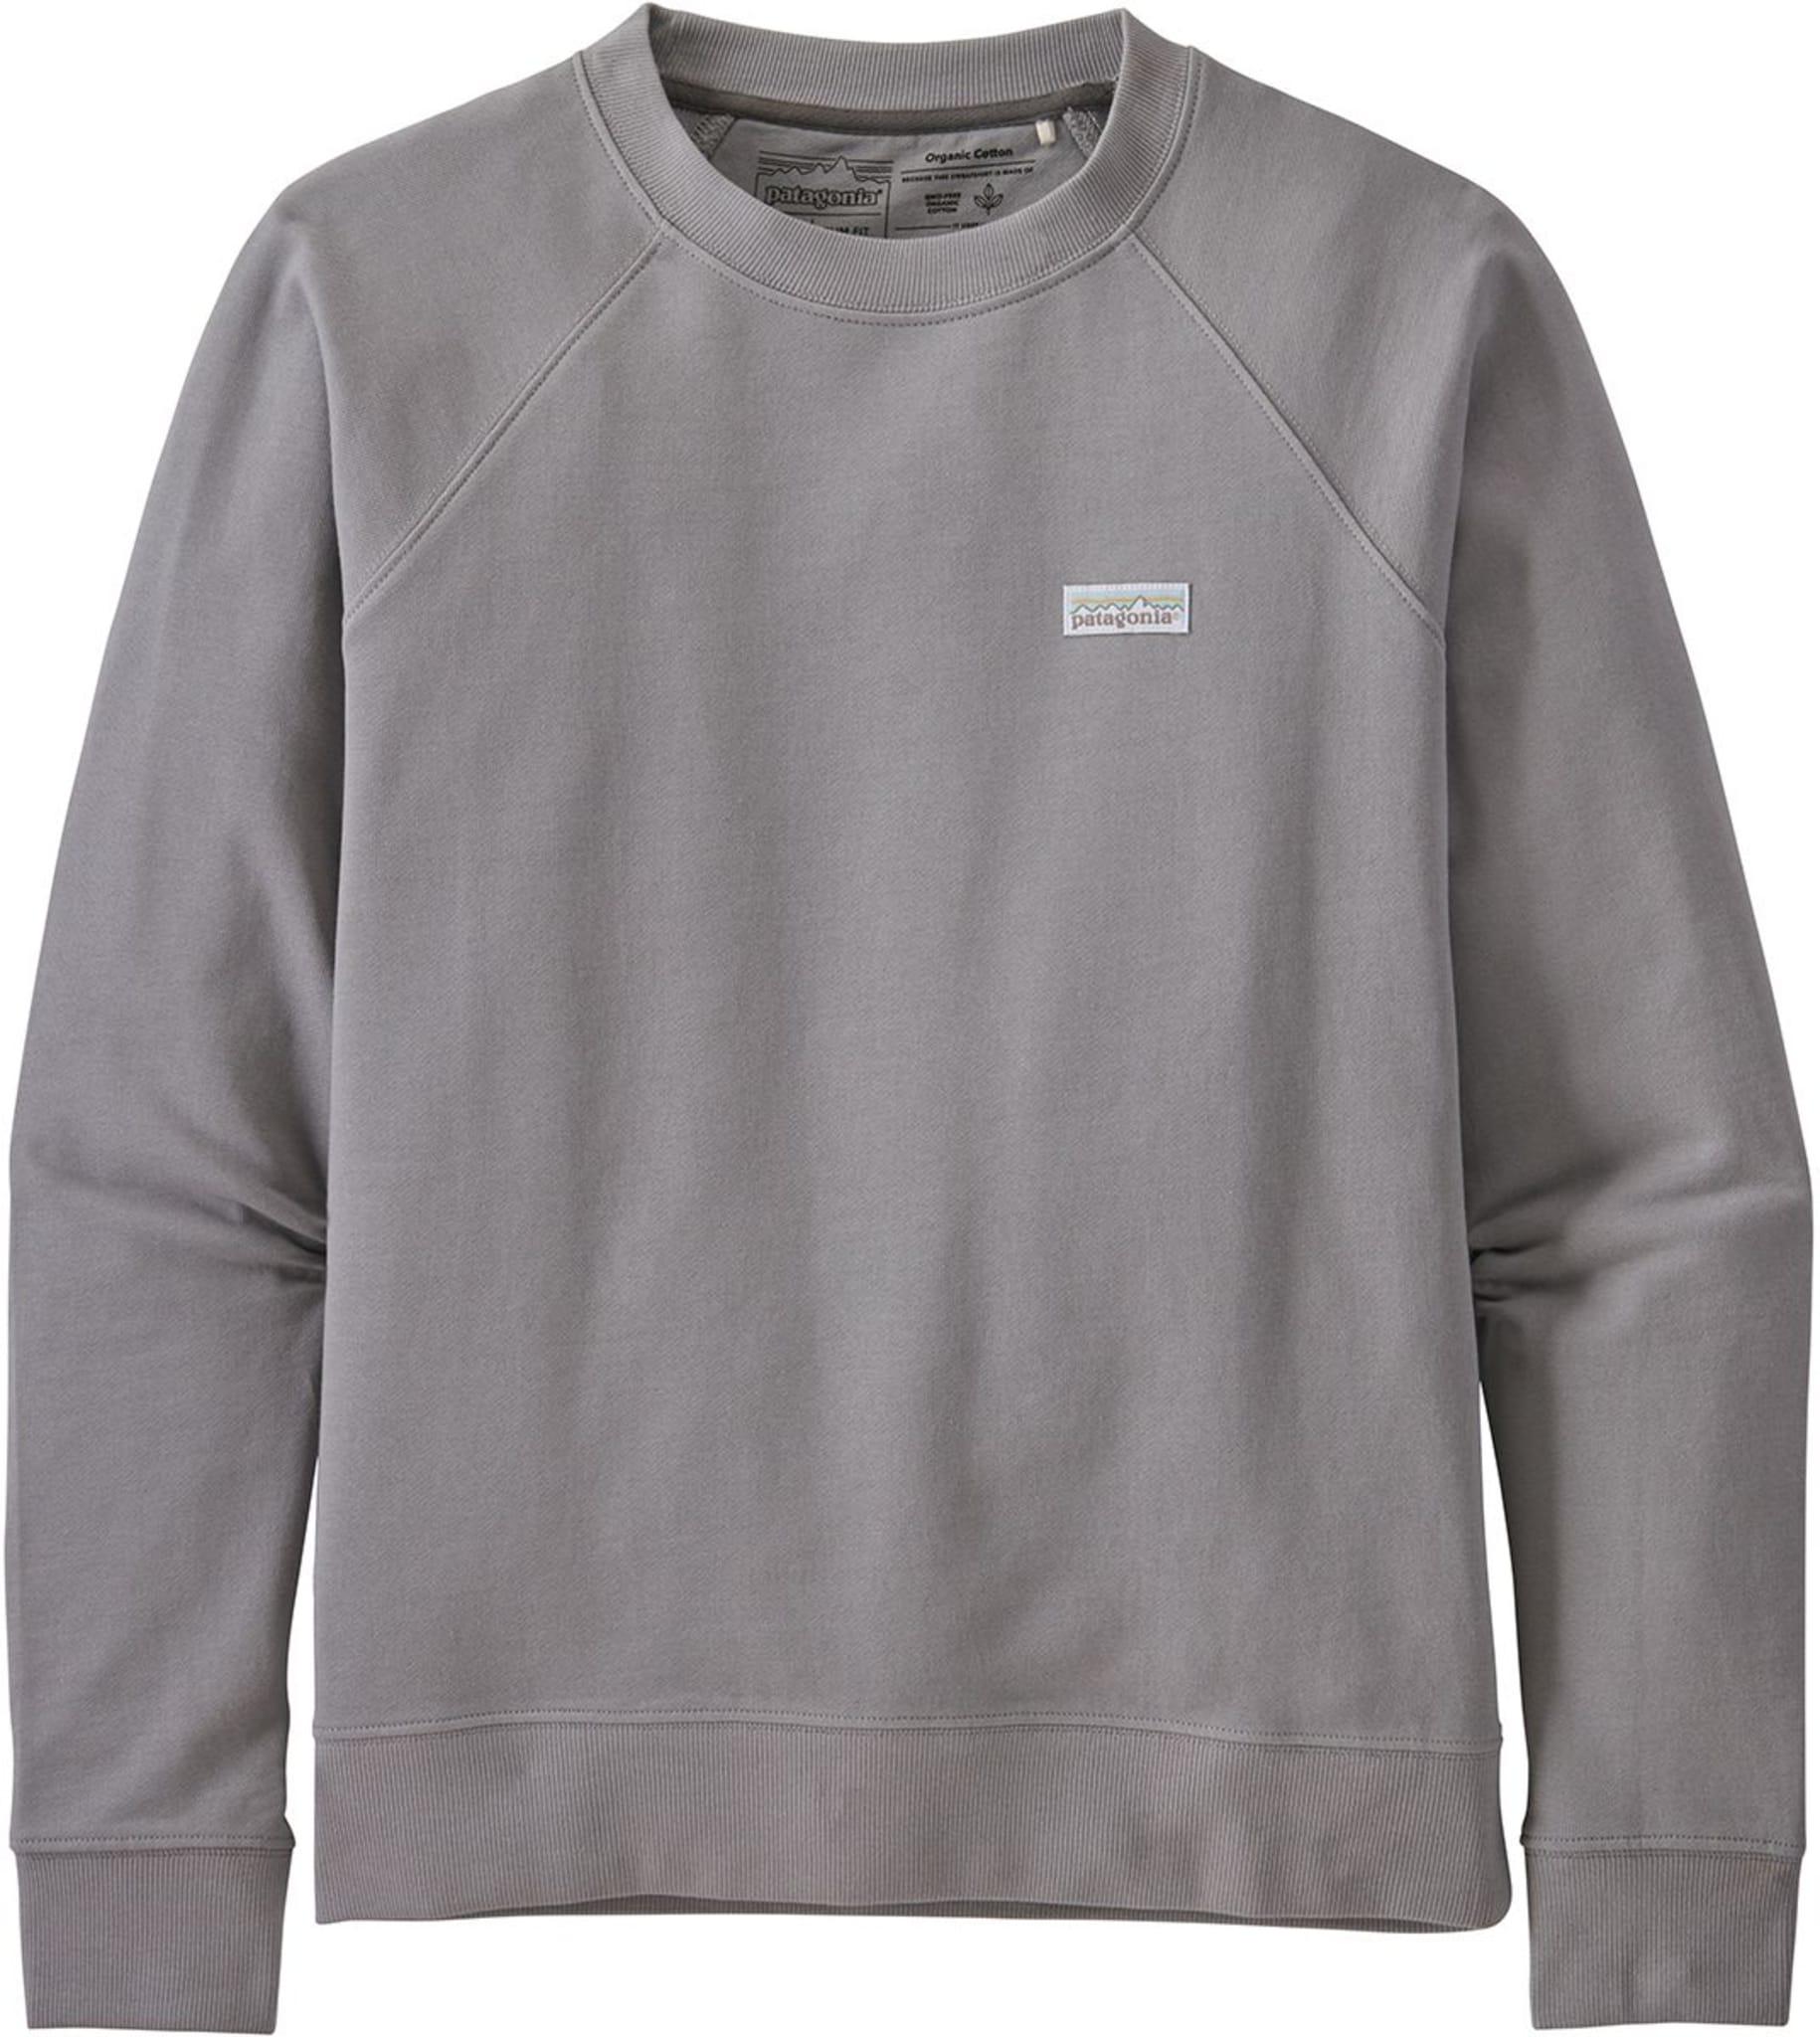 Ws Pastel P-6 Label Organic Crew Sweatshirt